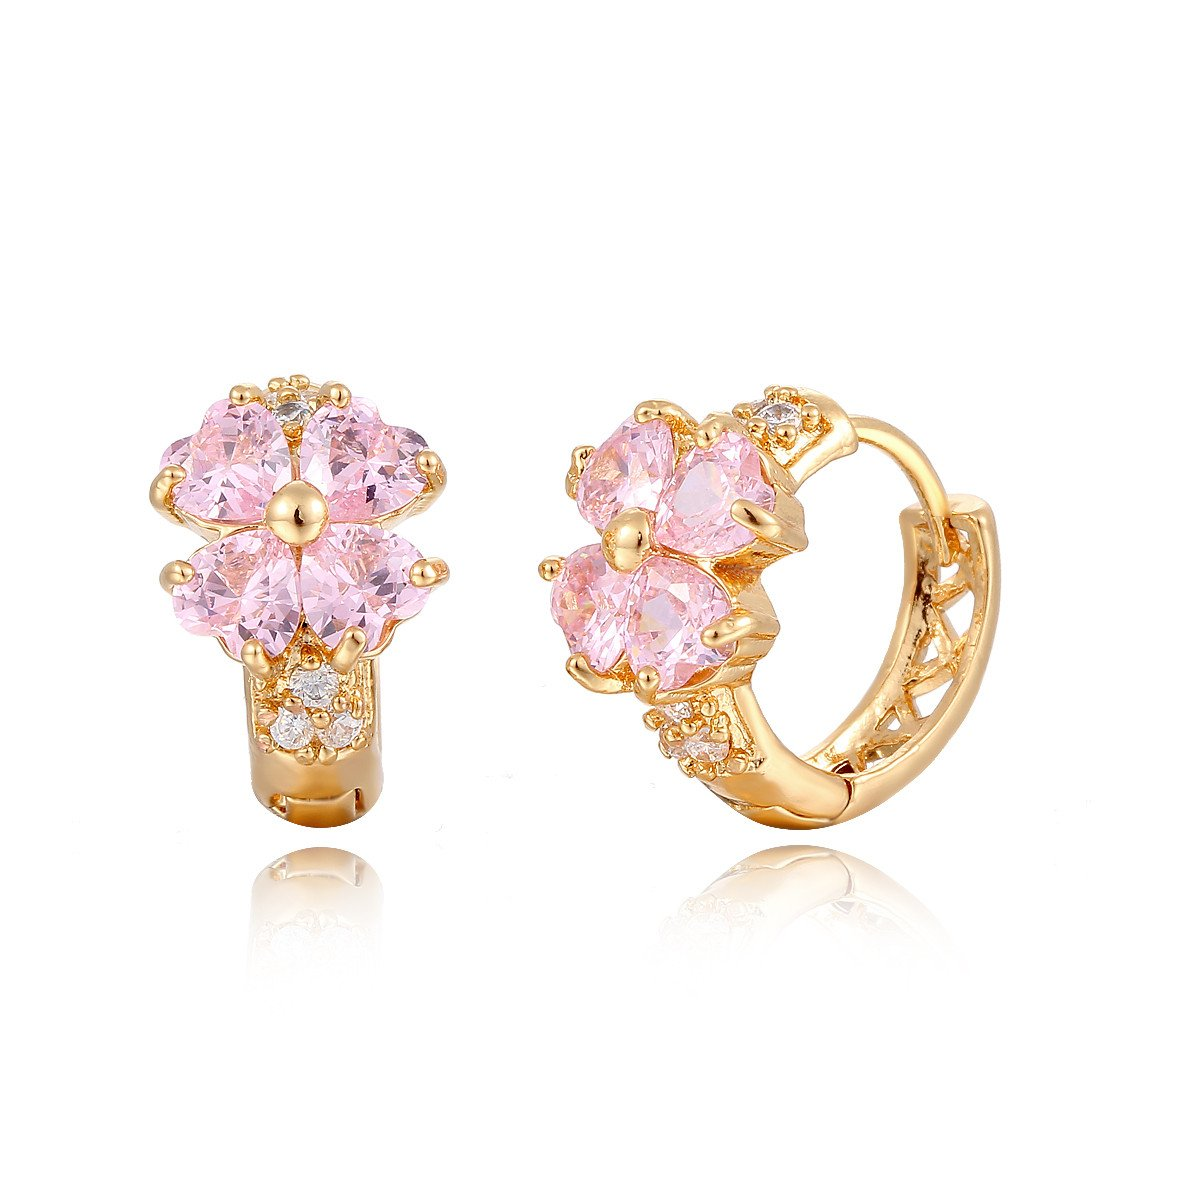 Windshow Girls 18K Gold Plated 4 Leaf Clover Heart Cut Small Hoop Huggie Earrings ABE001/004/013/036/319